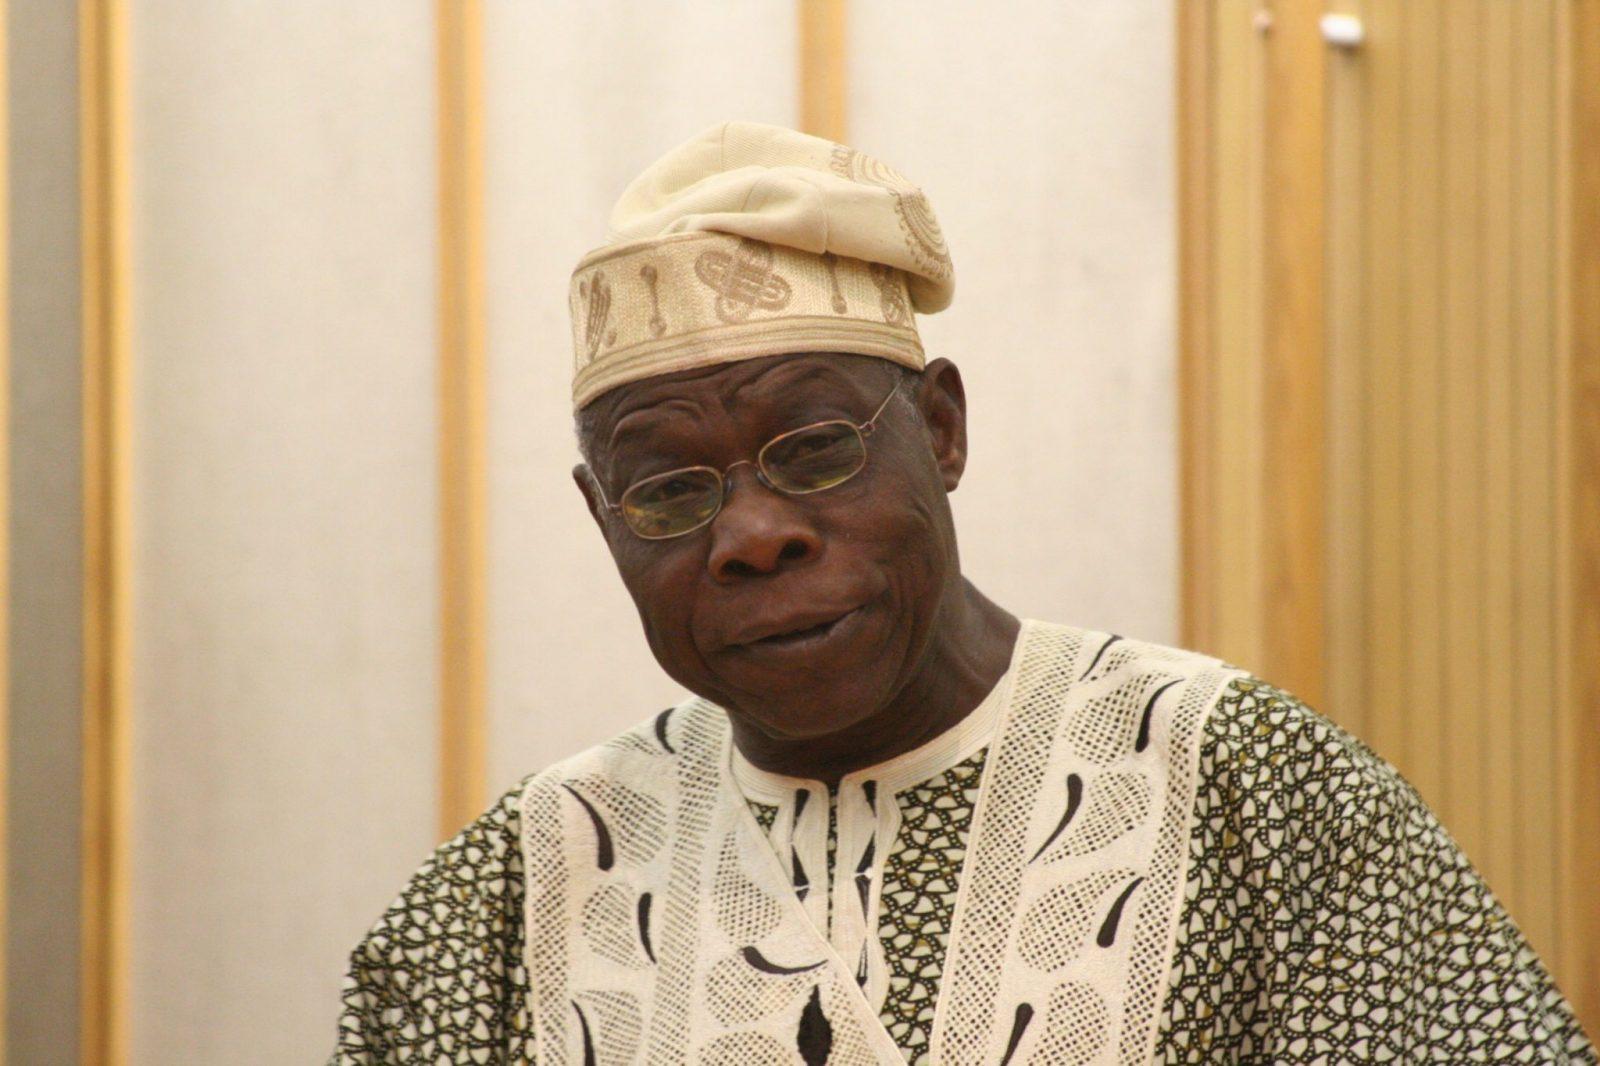 #ENDSARS Protest – Former President Olusegun Obasanjo Addresses the Nation